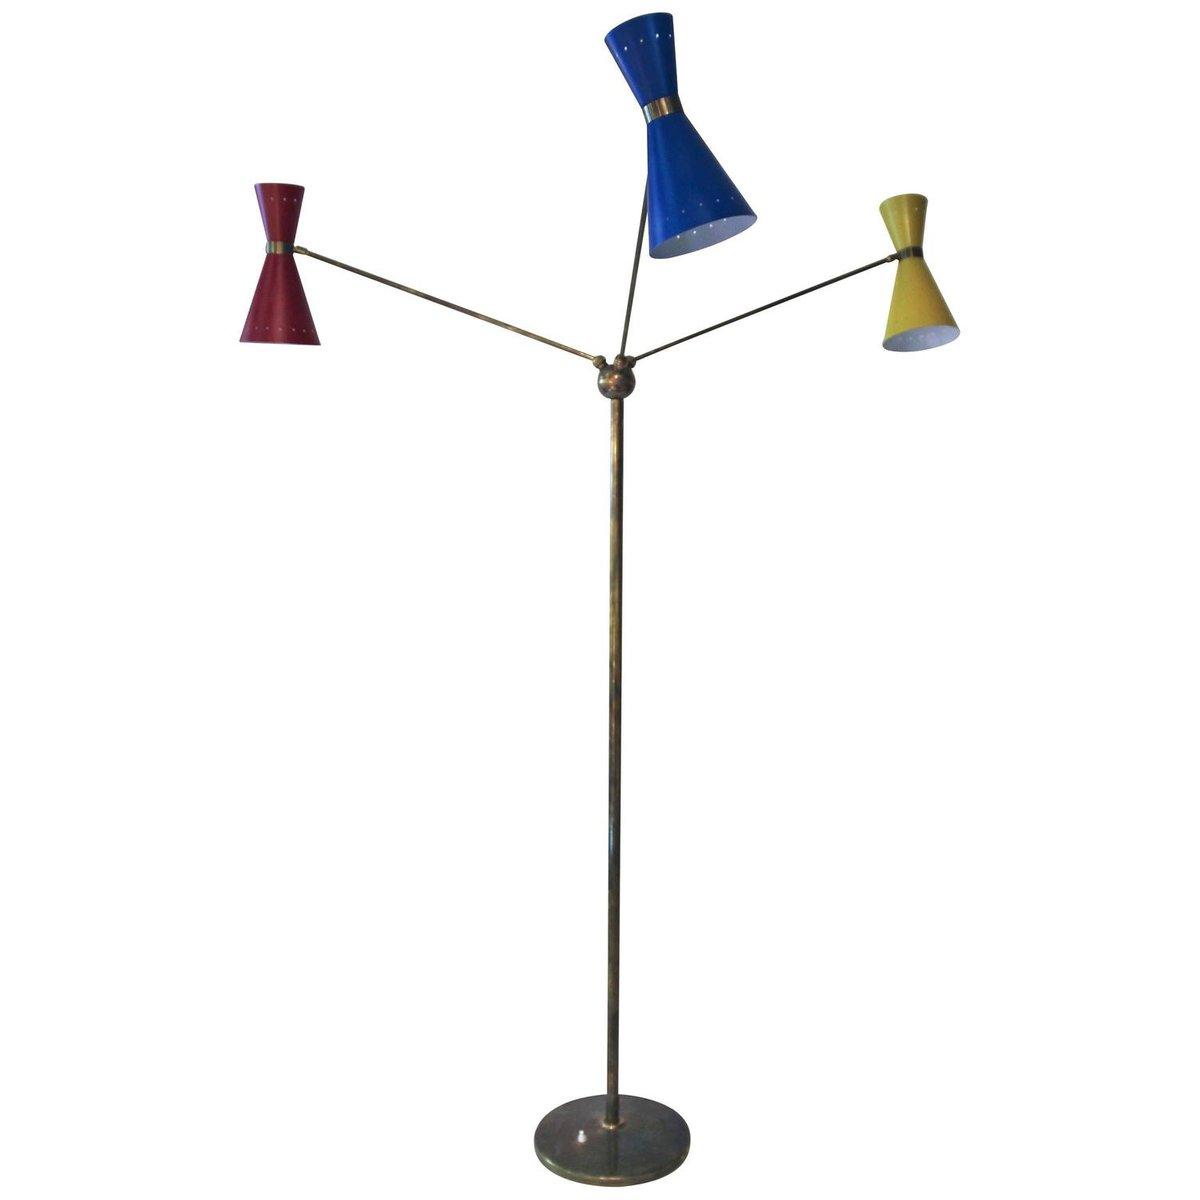 Three Bulb Floor Lamp: Italian Triennale Brass and Metal Floor Lamp with Three Lights, 1960s for  sale at Pamono,Lighting